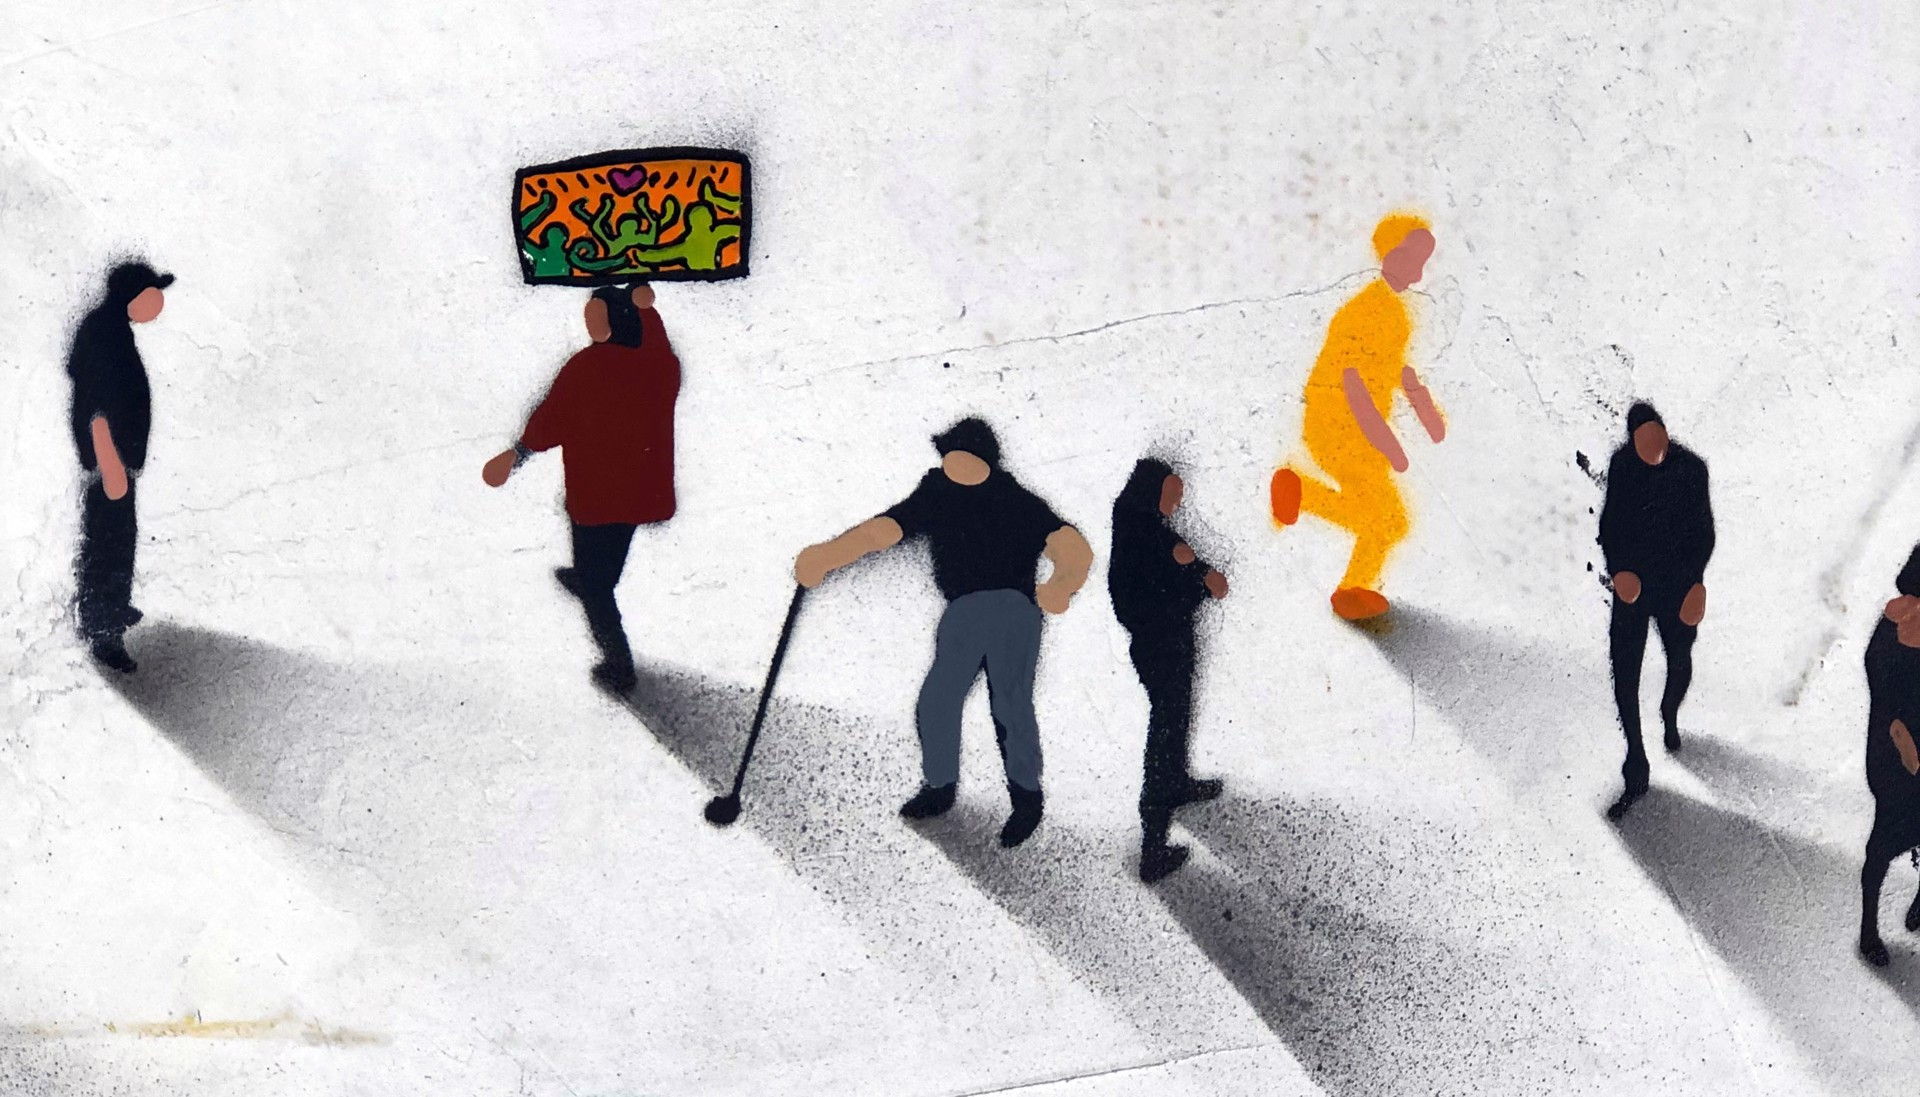 Are We Having Fun Yet by Craig Alan, Populus Homage